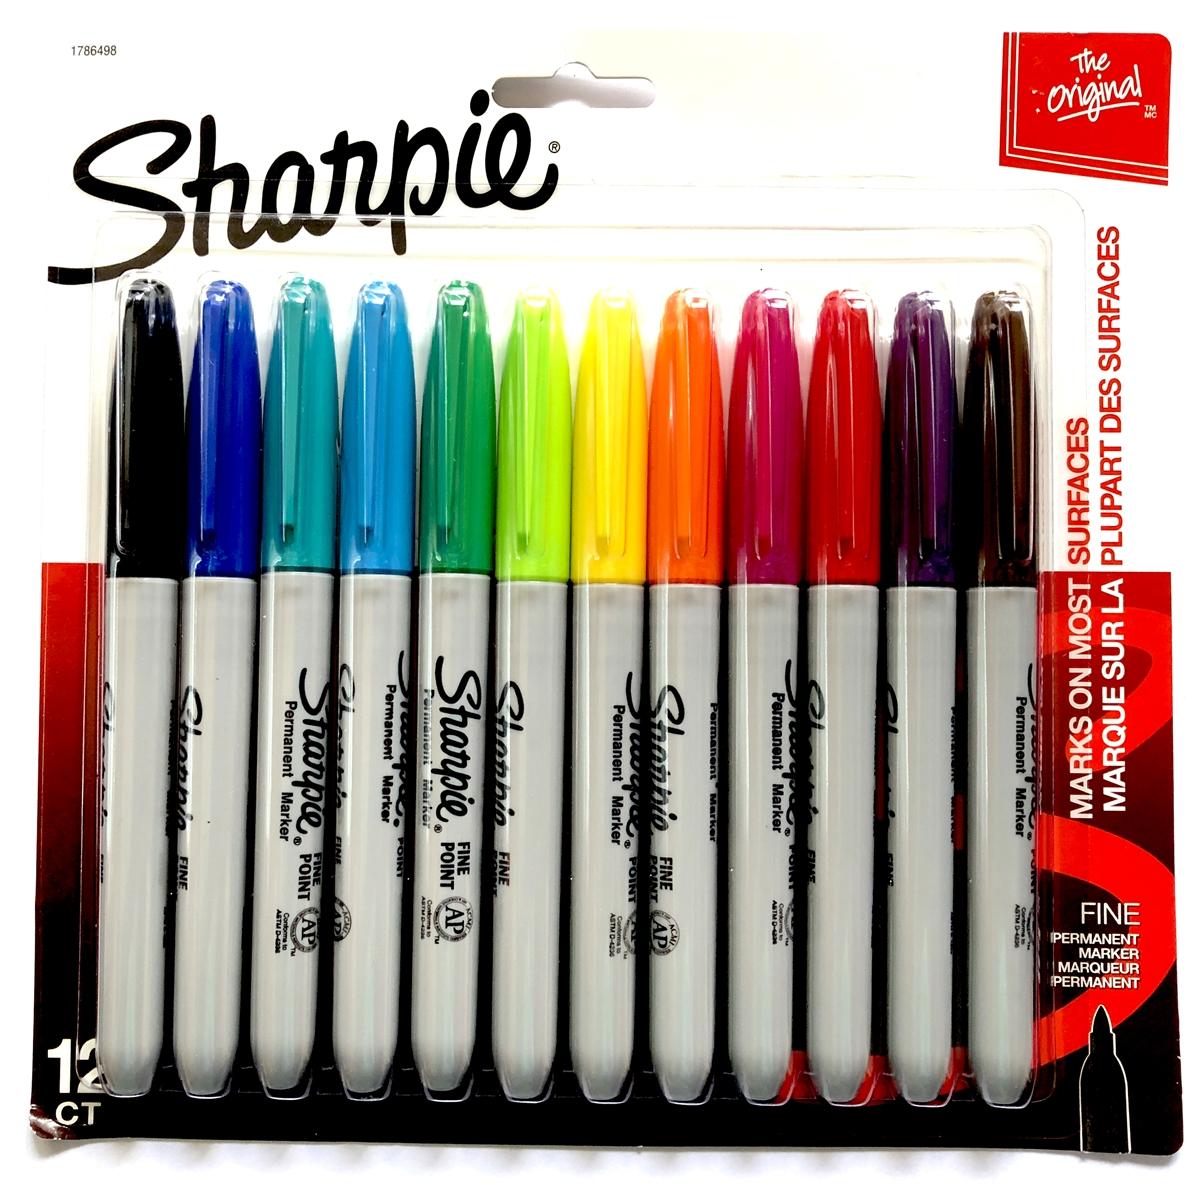 sharpie marker pen set